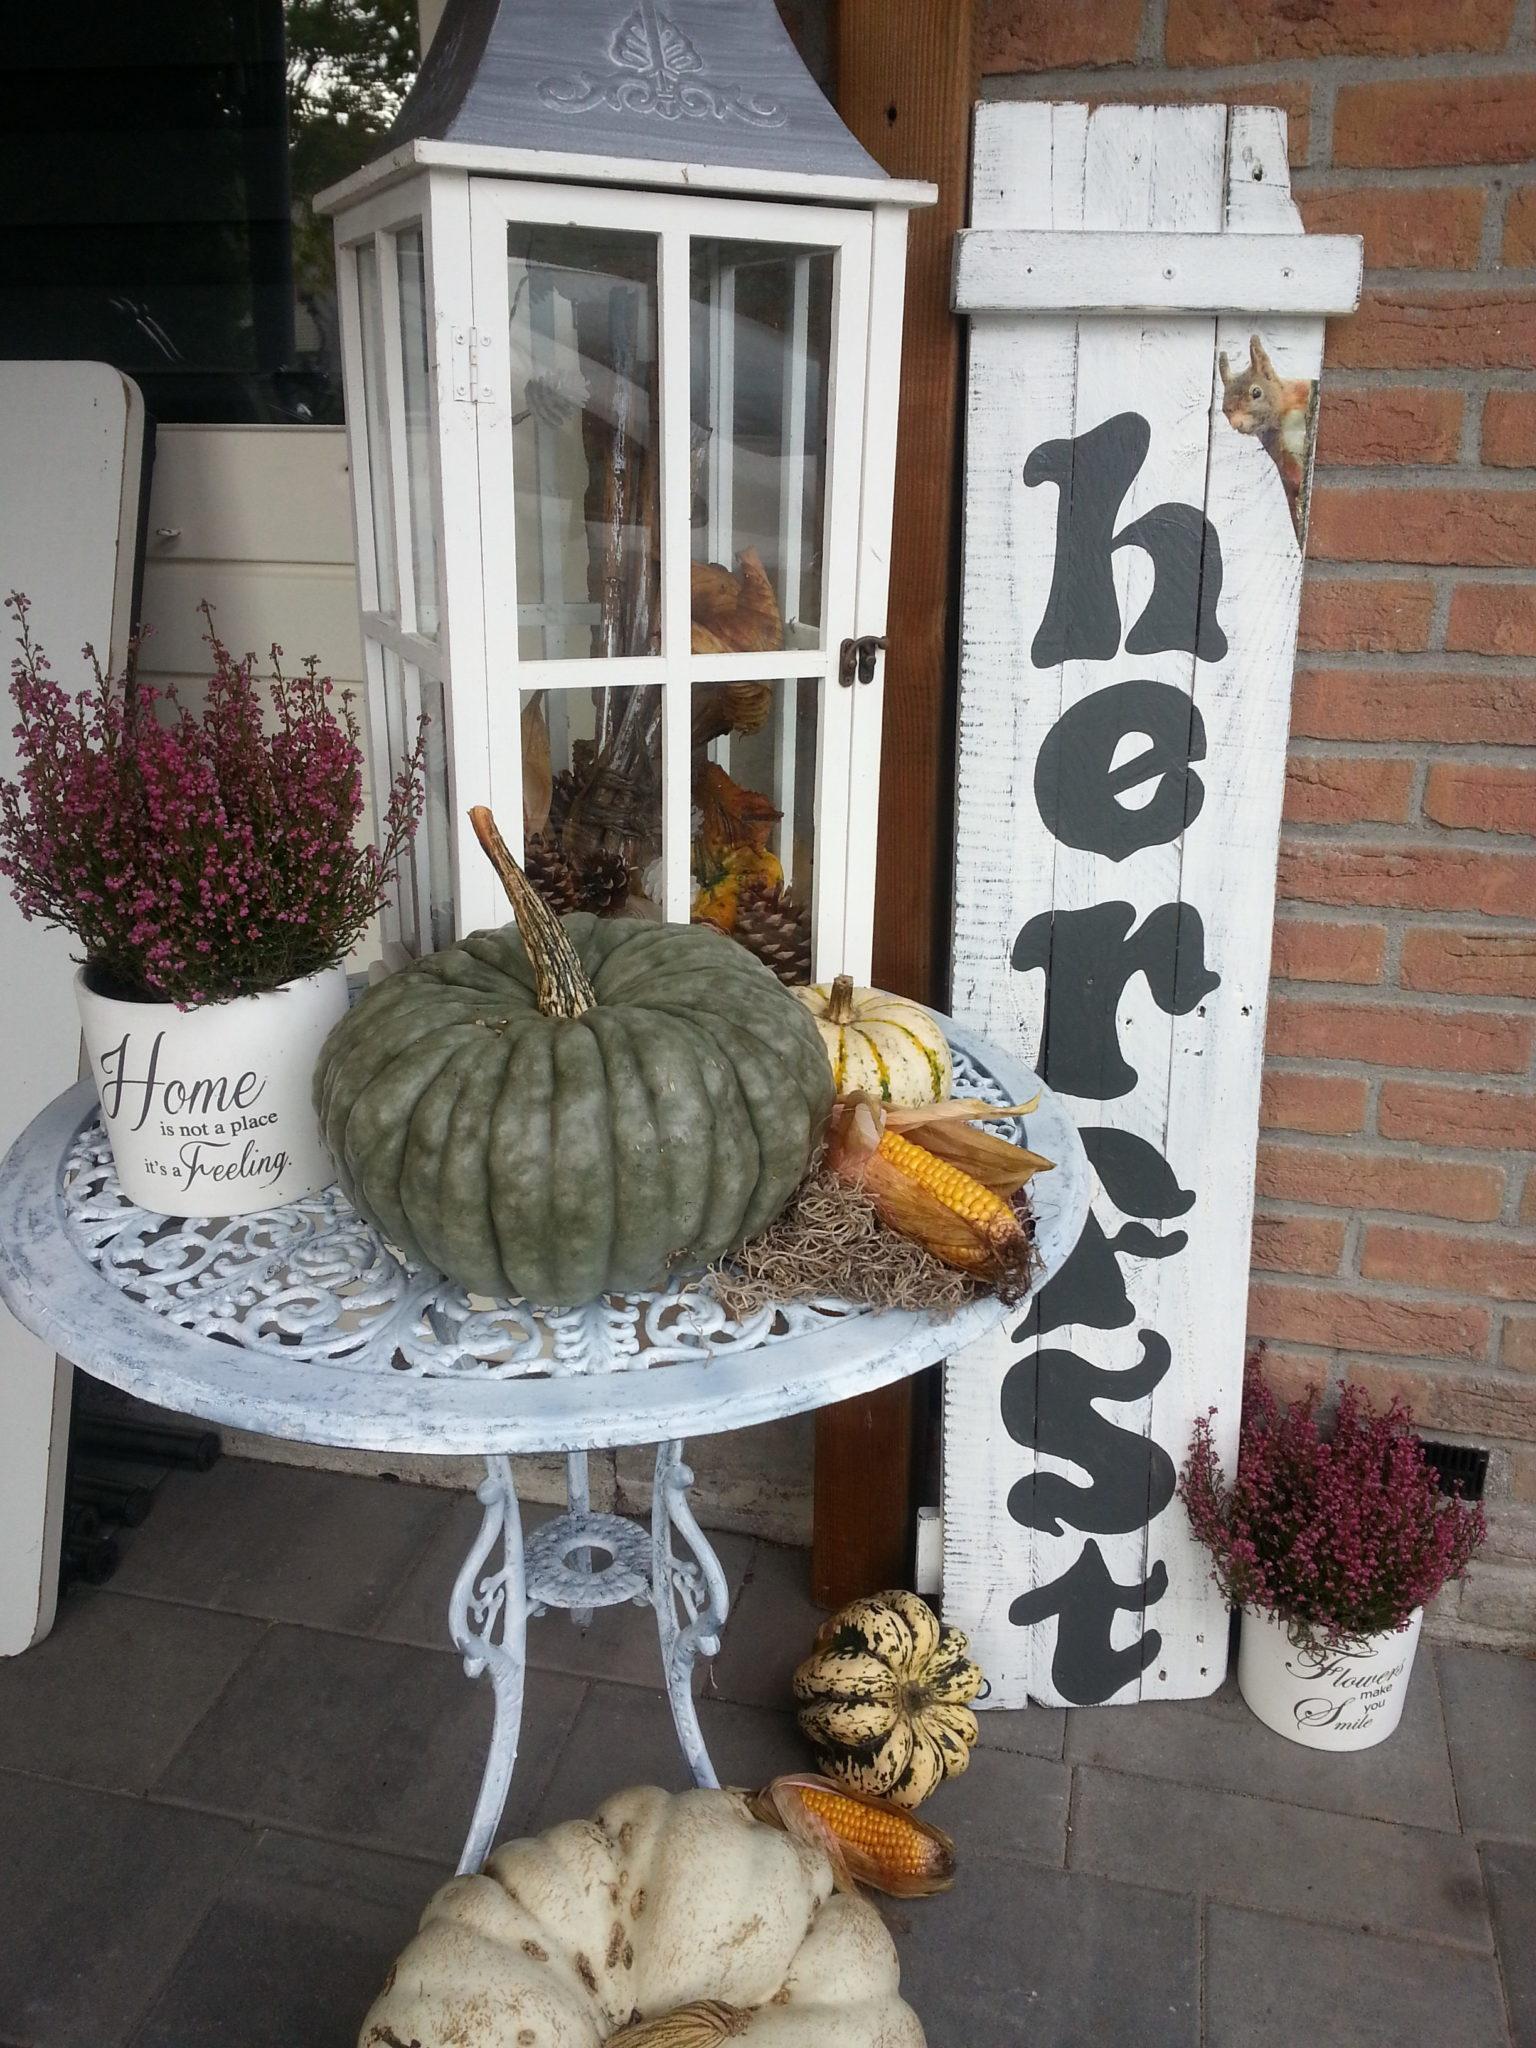 Decvo-bord: Herfst / Winter